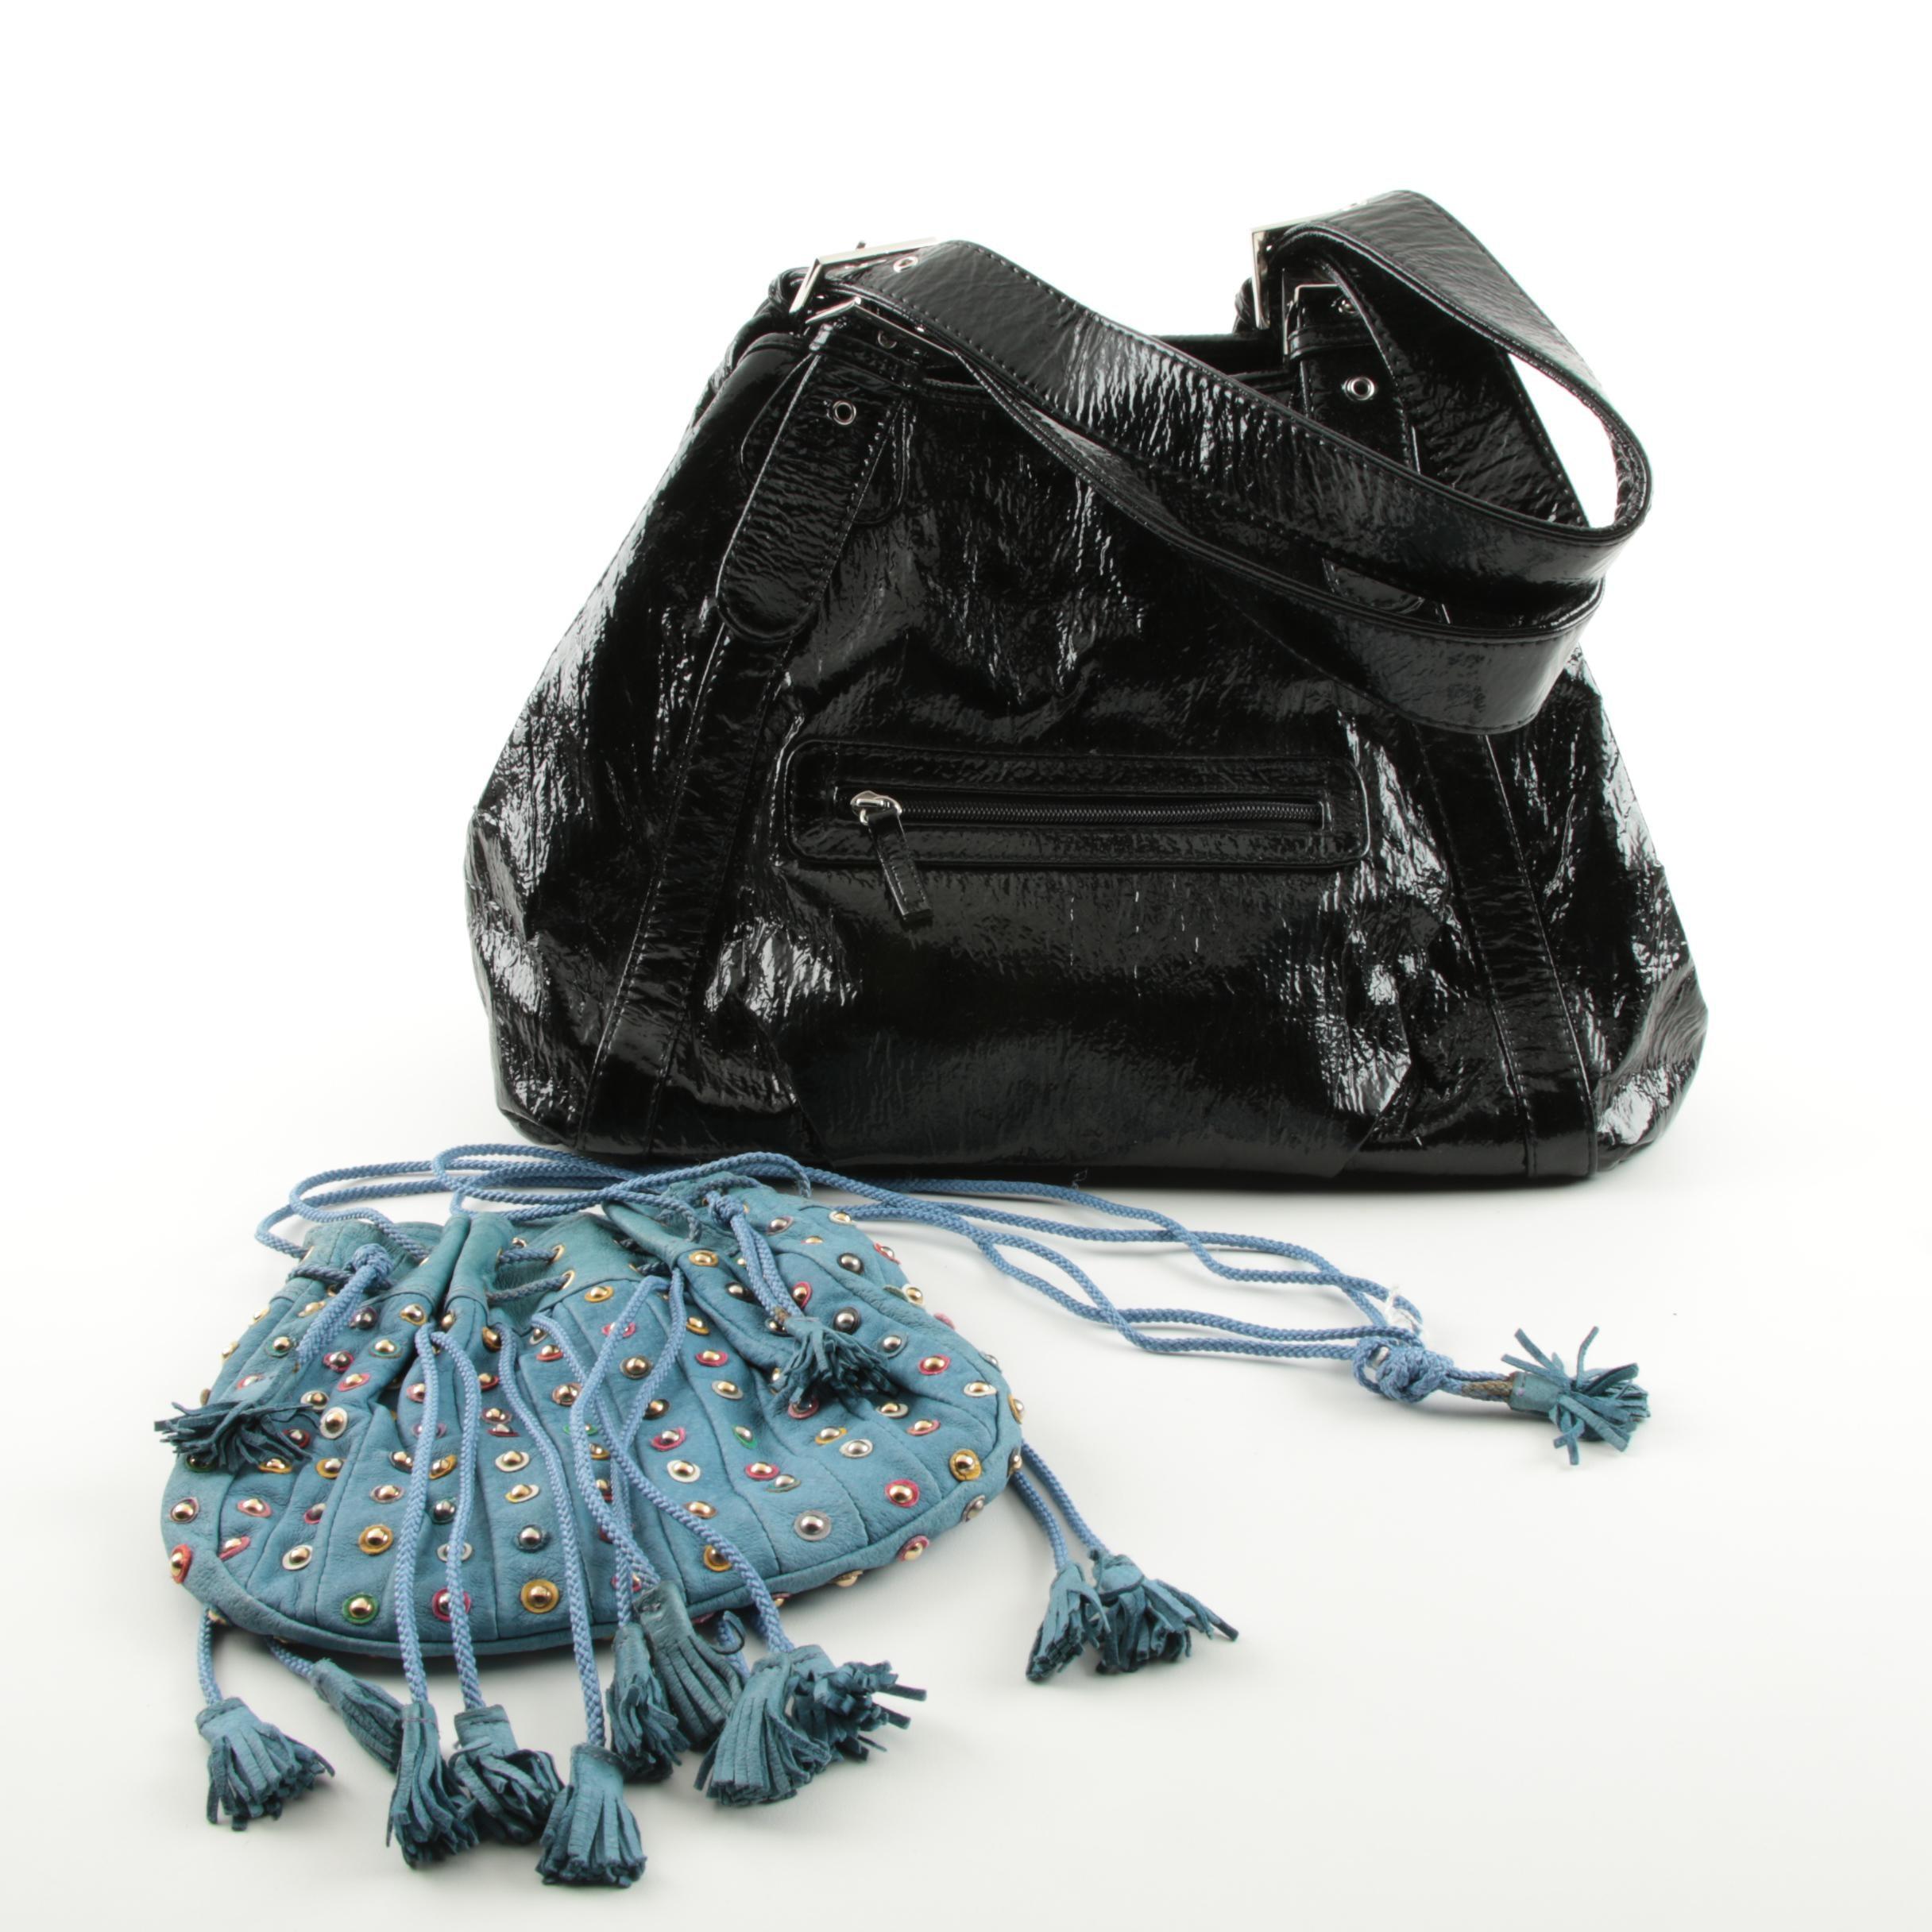 I.Magnin and Big Buddha Leather Handbags